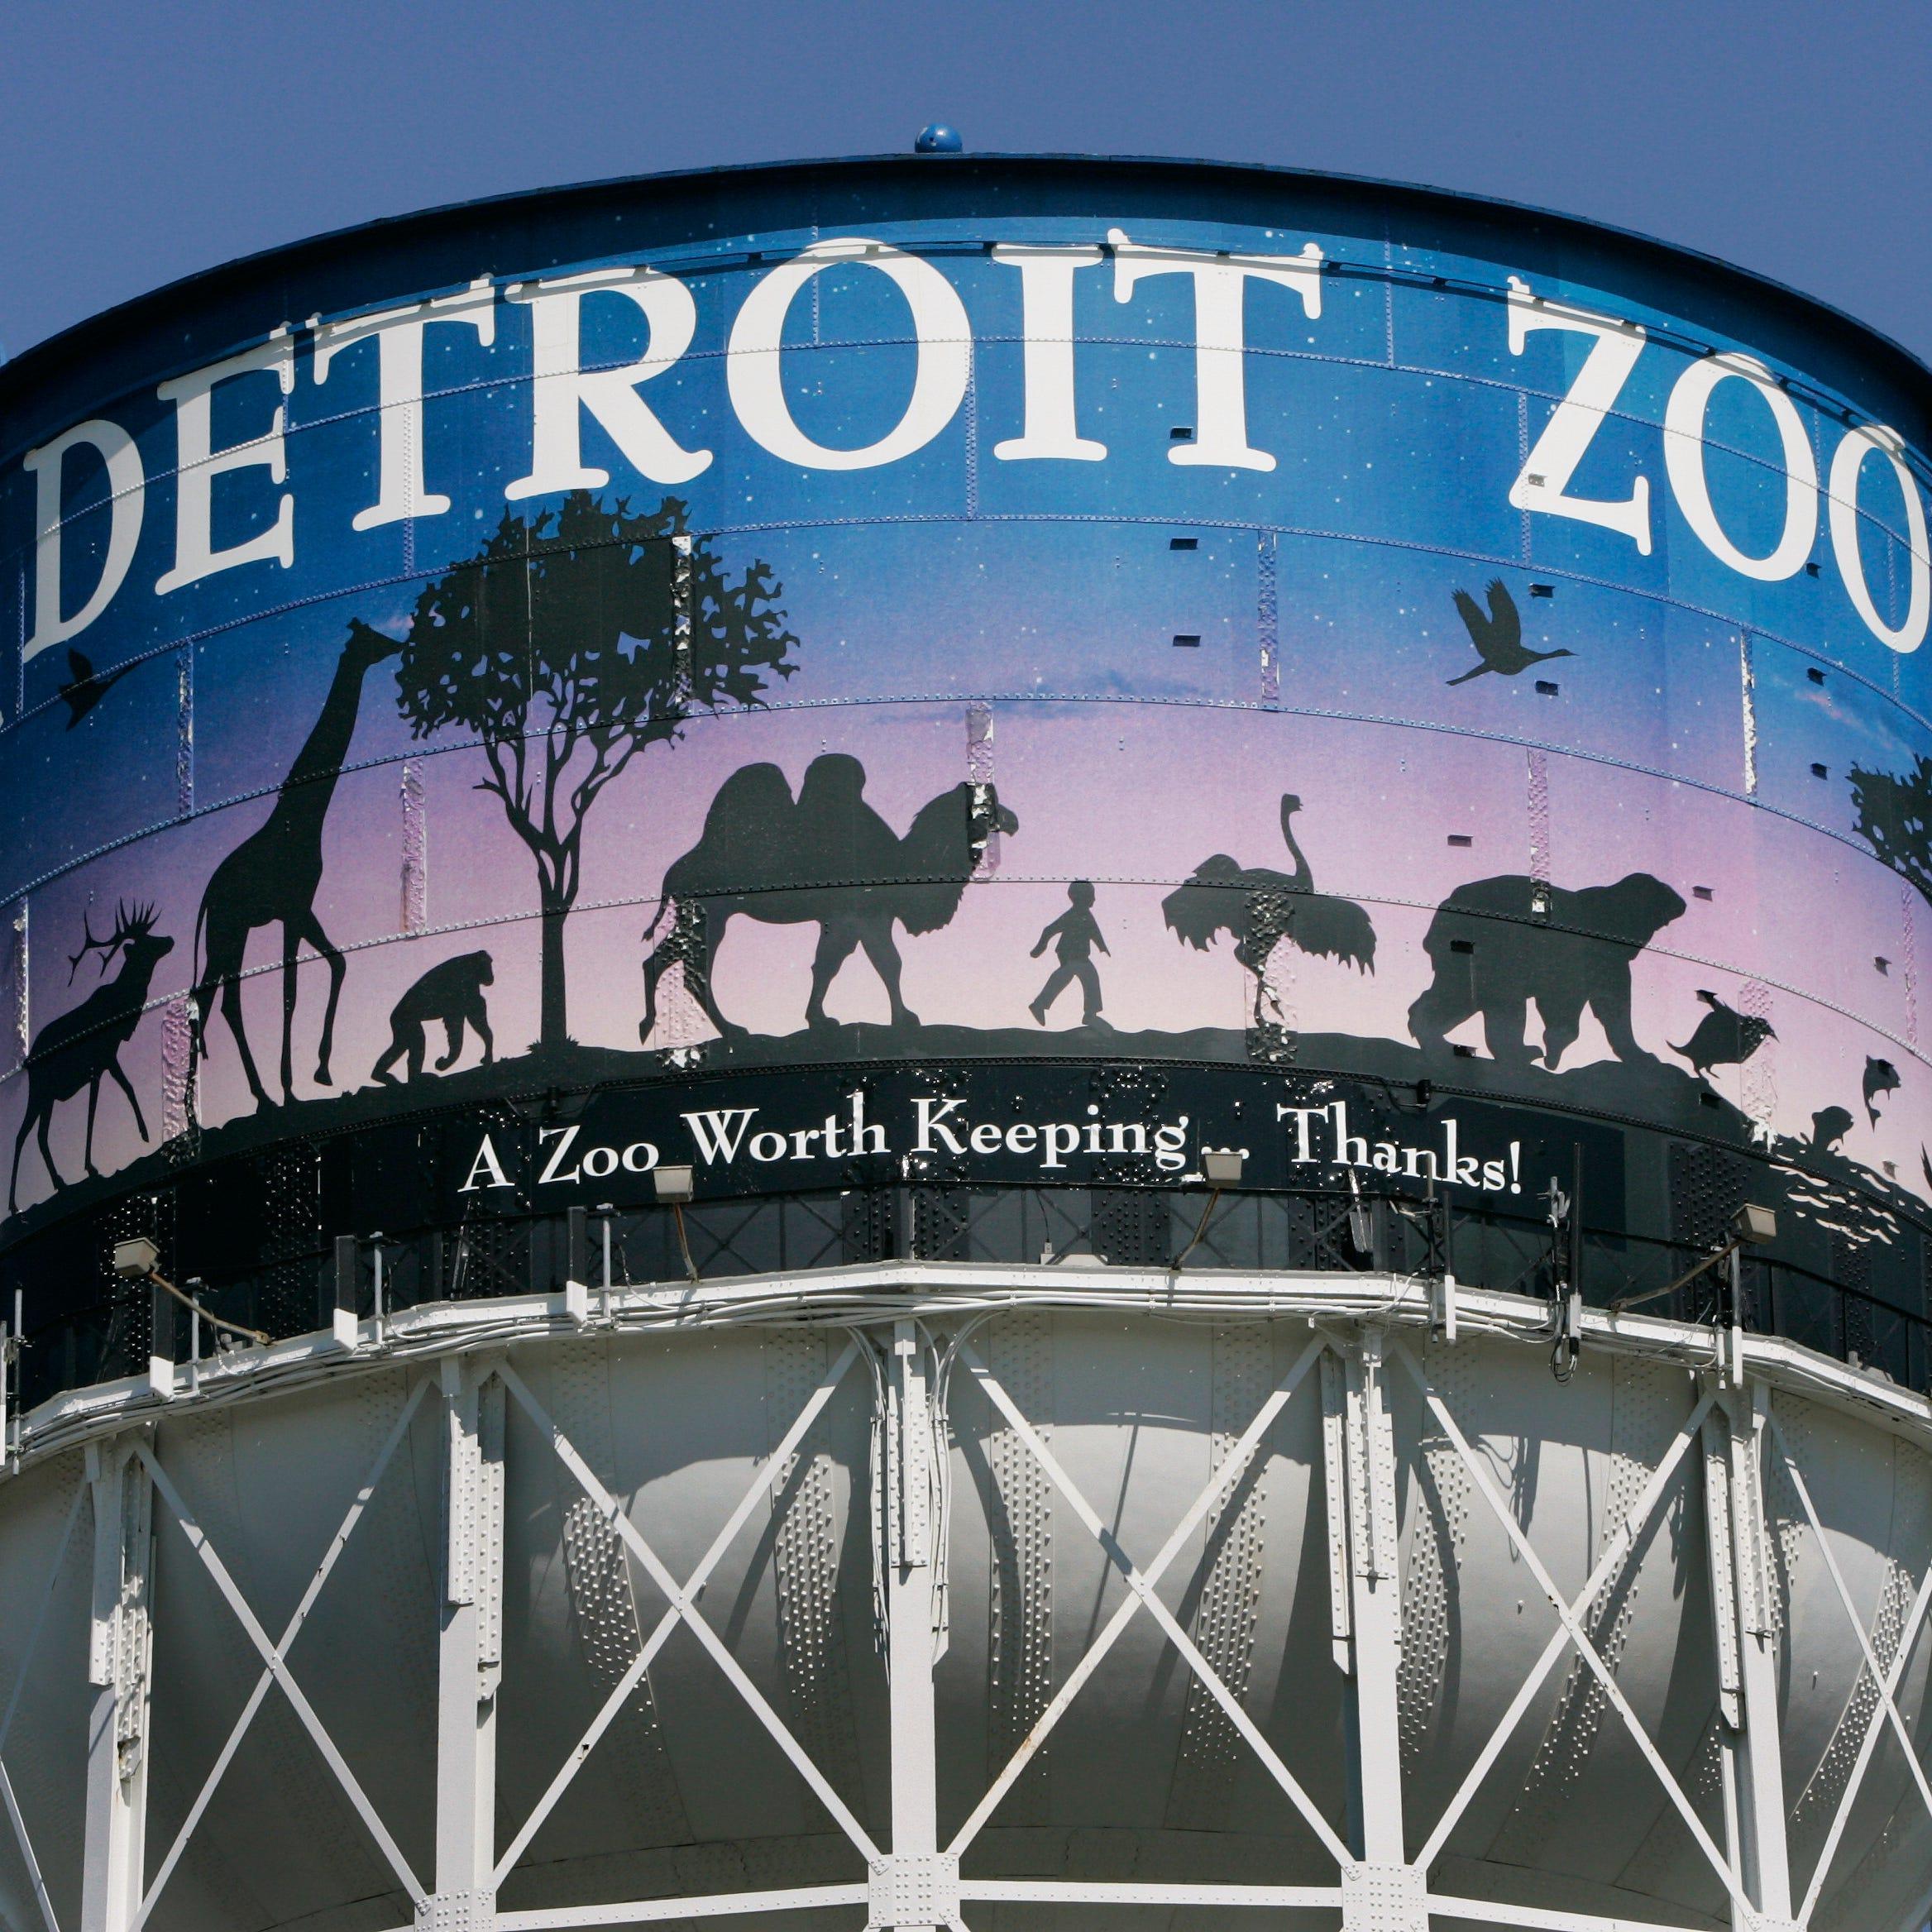 Forecast improves, Detroit Zoo animals venture outside